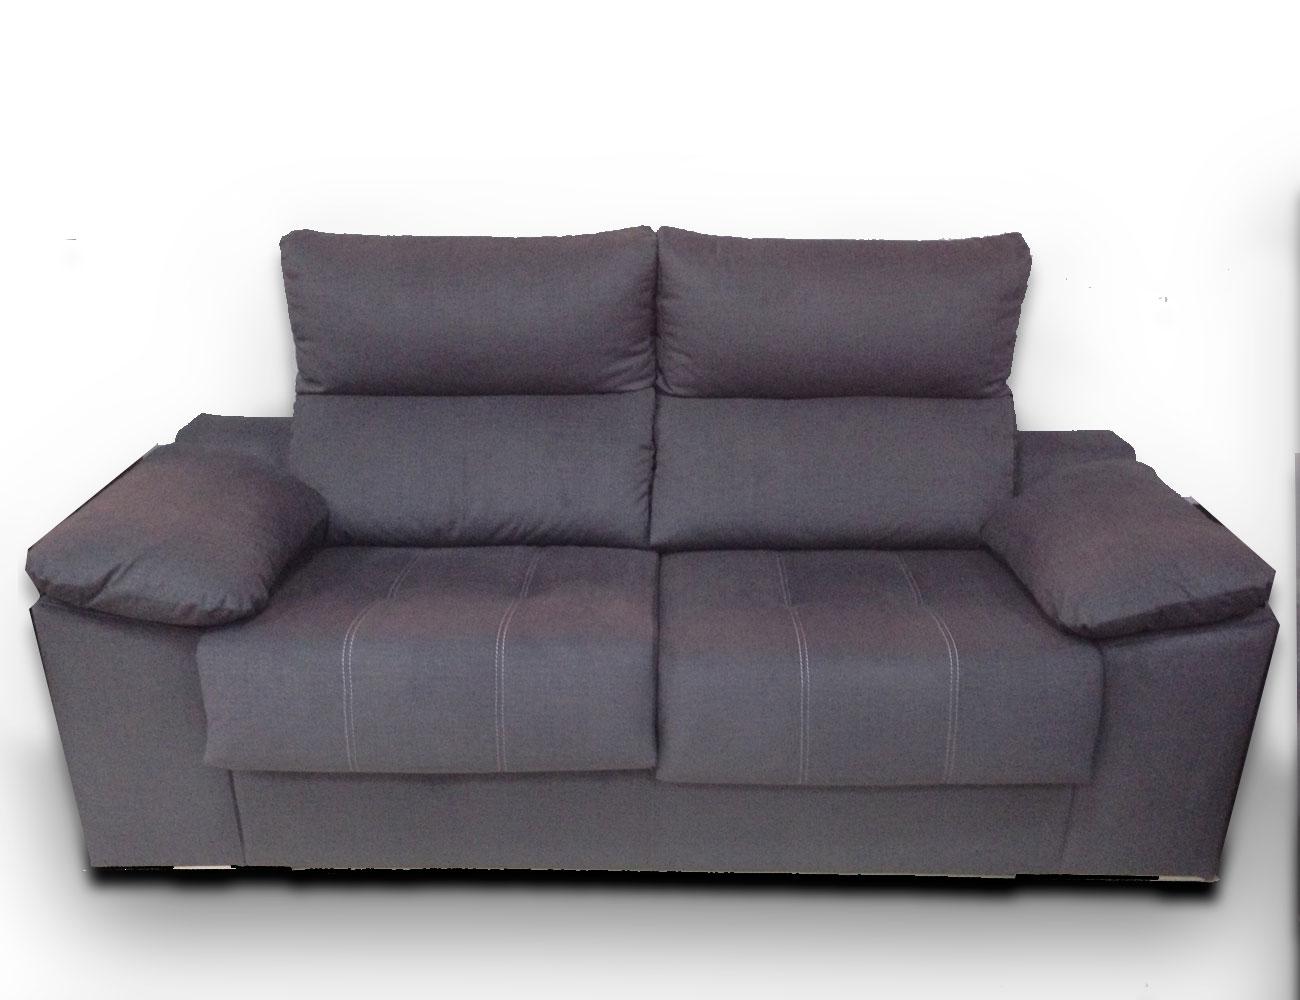 Sofa 3 plazas5